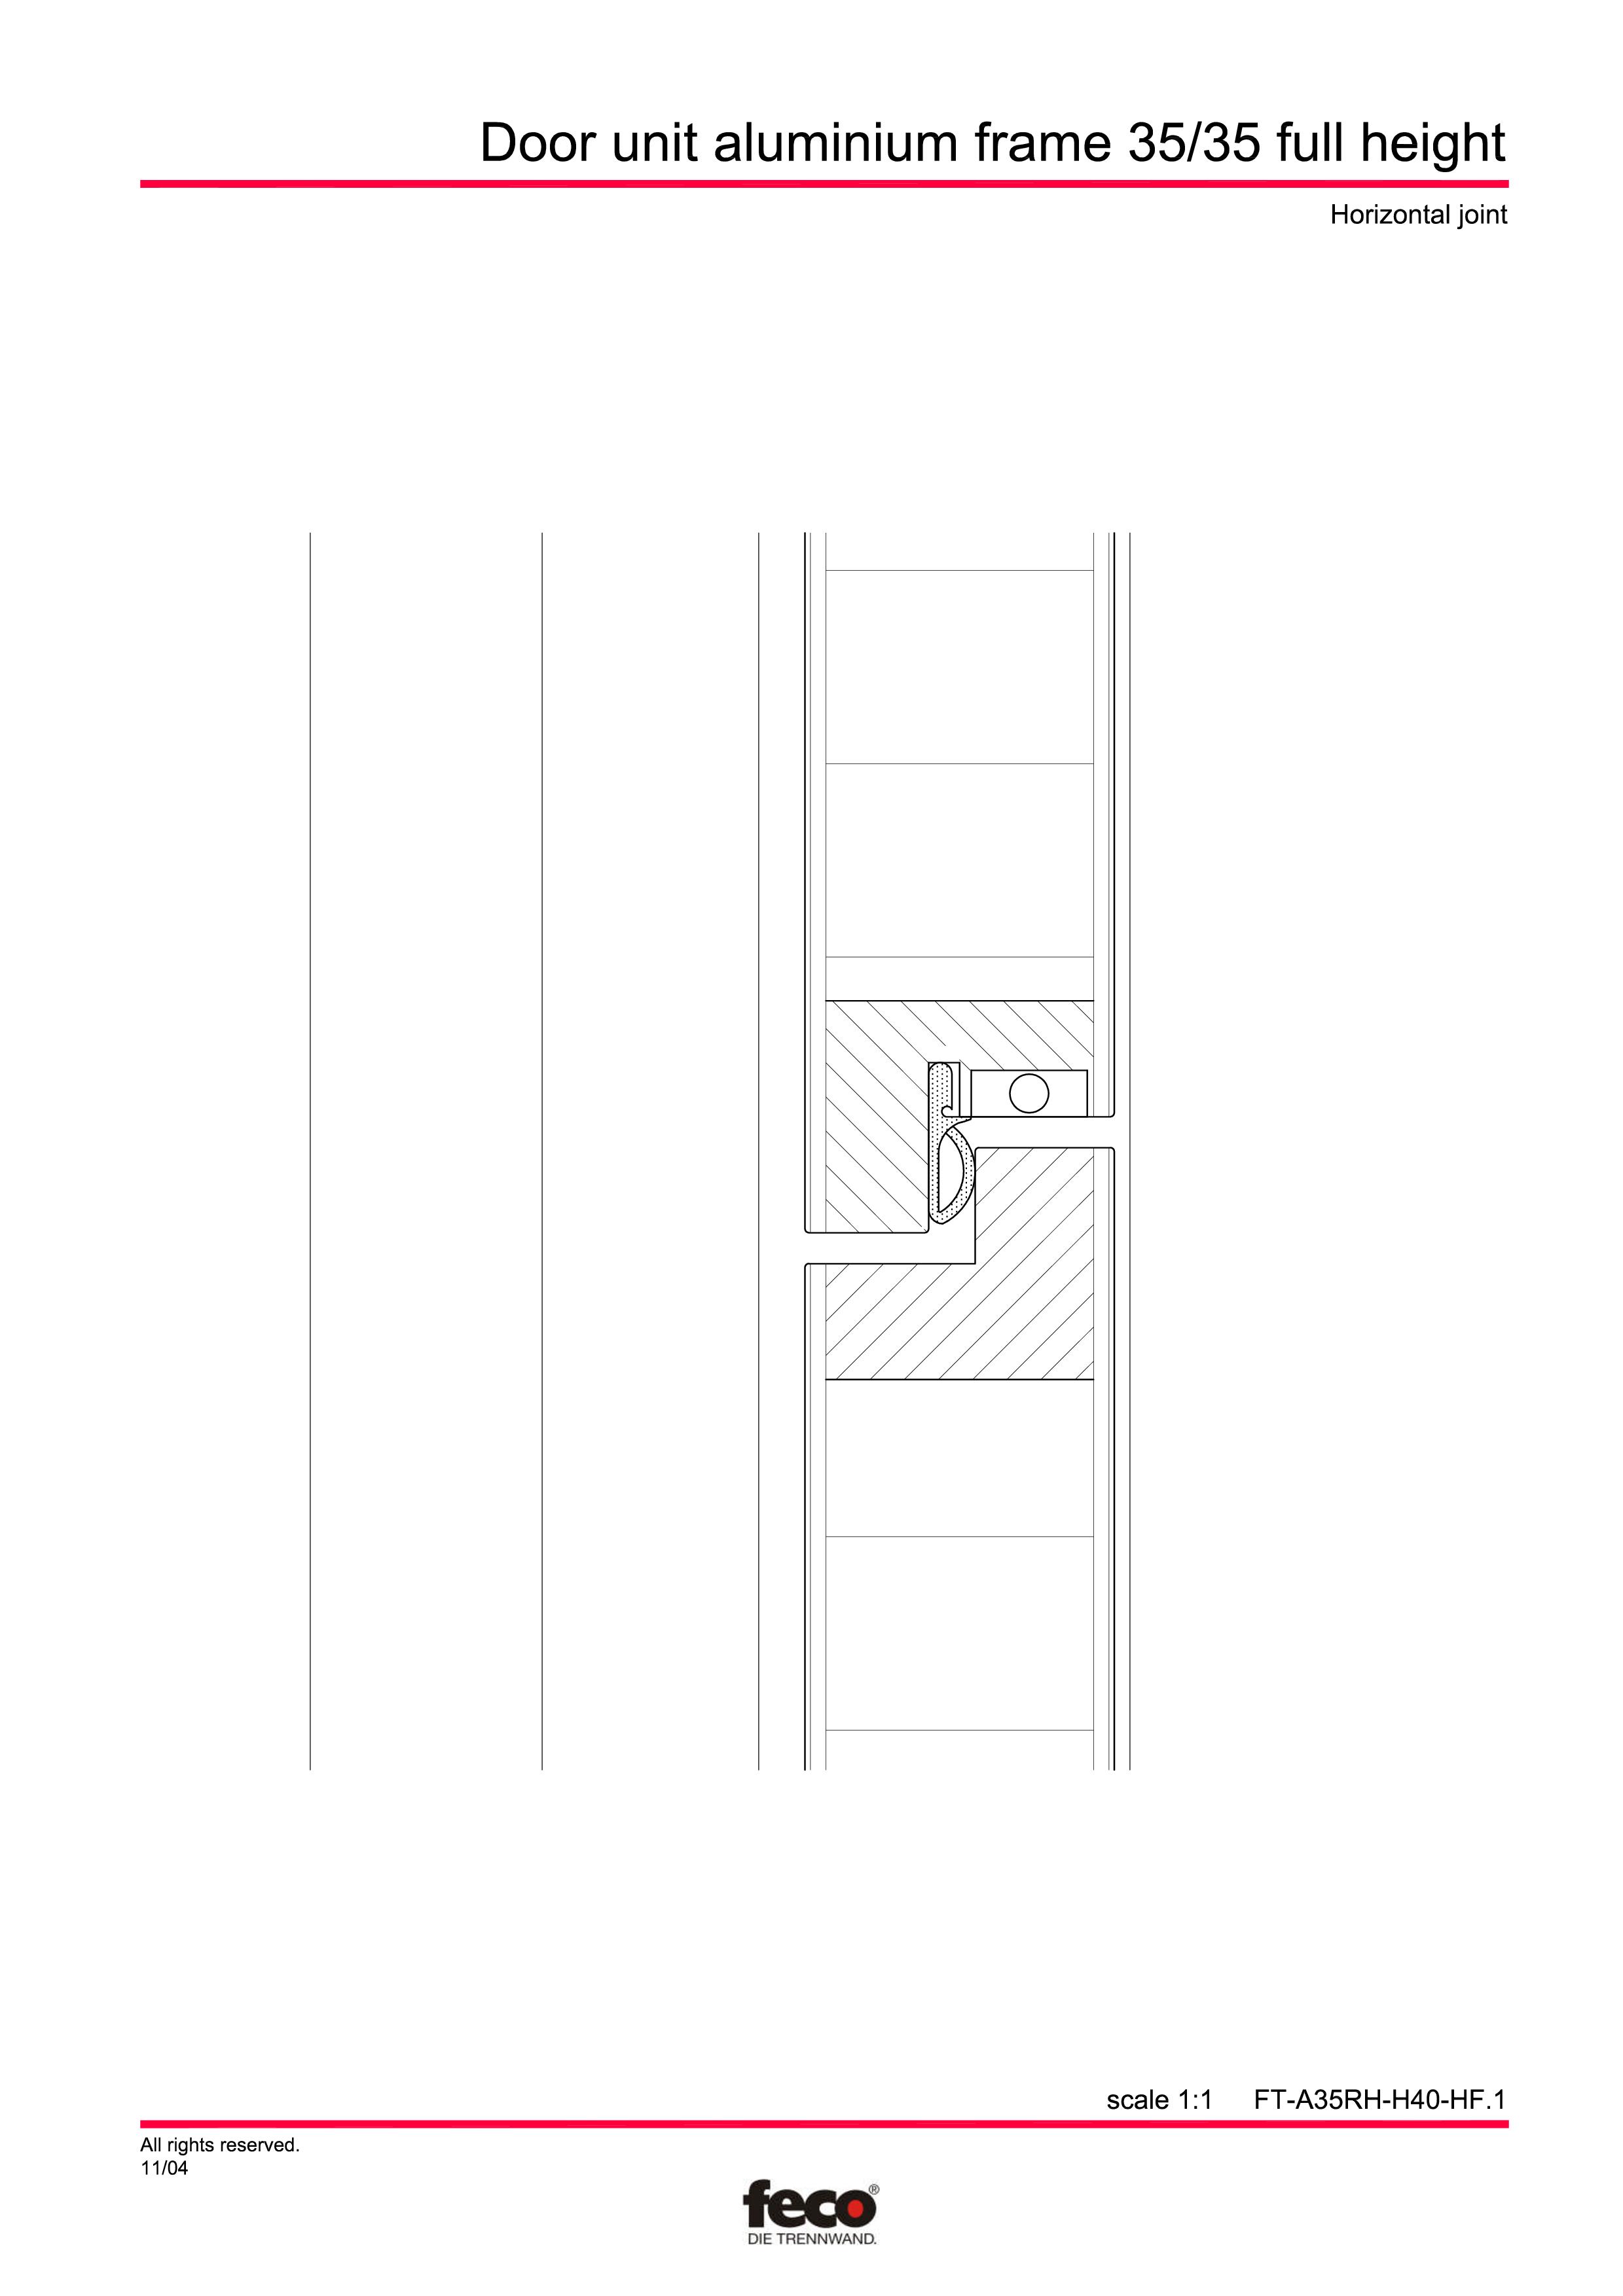 Pagina 3 - CAD-PDF Profile usi din aluminiu (pana la planseu) FECO Detaliu de montaj